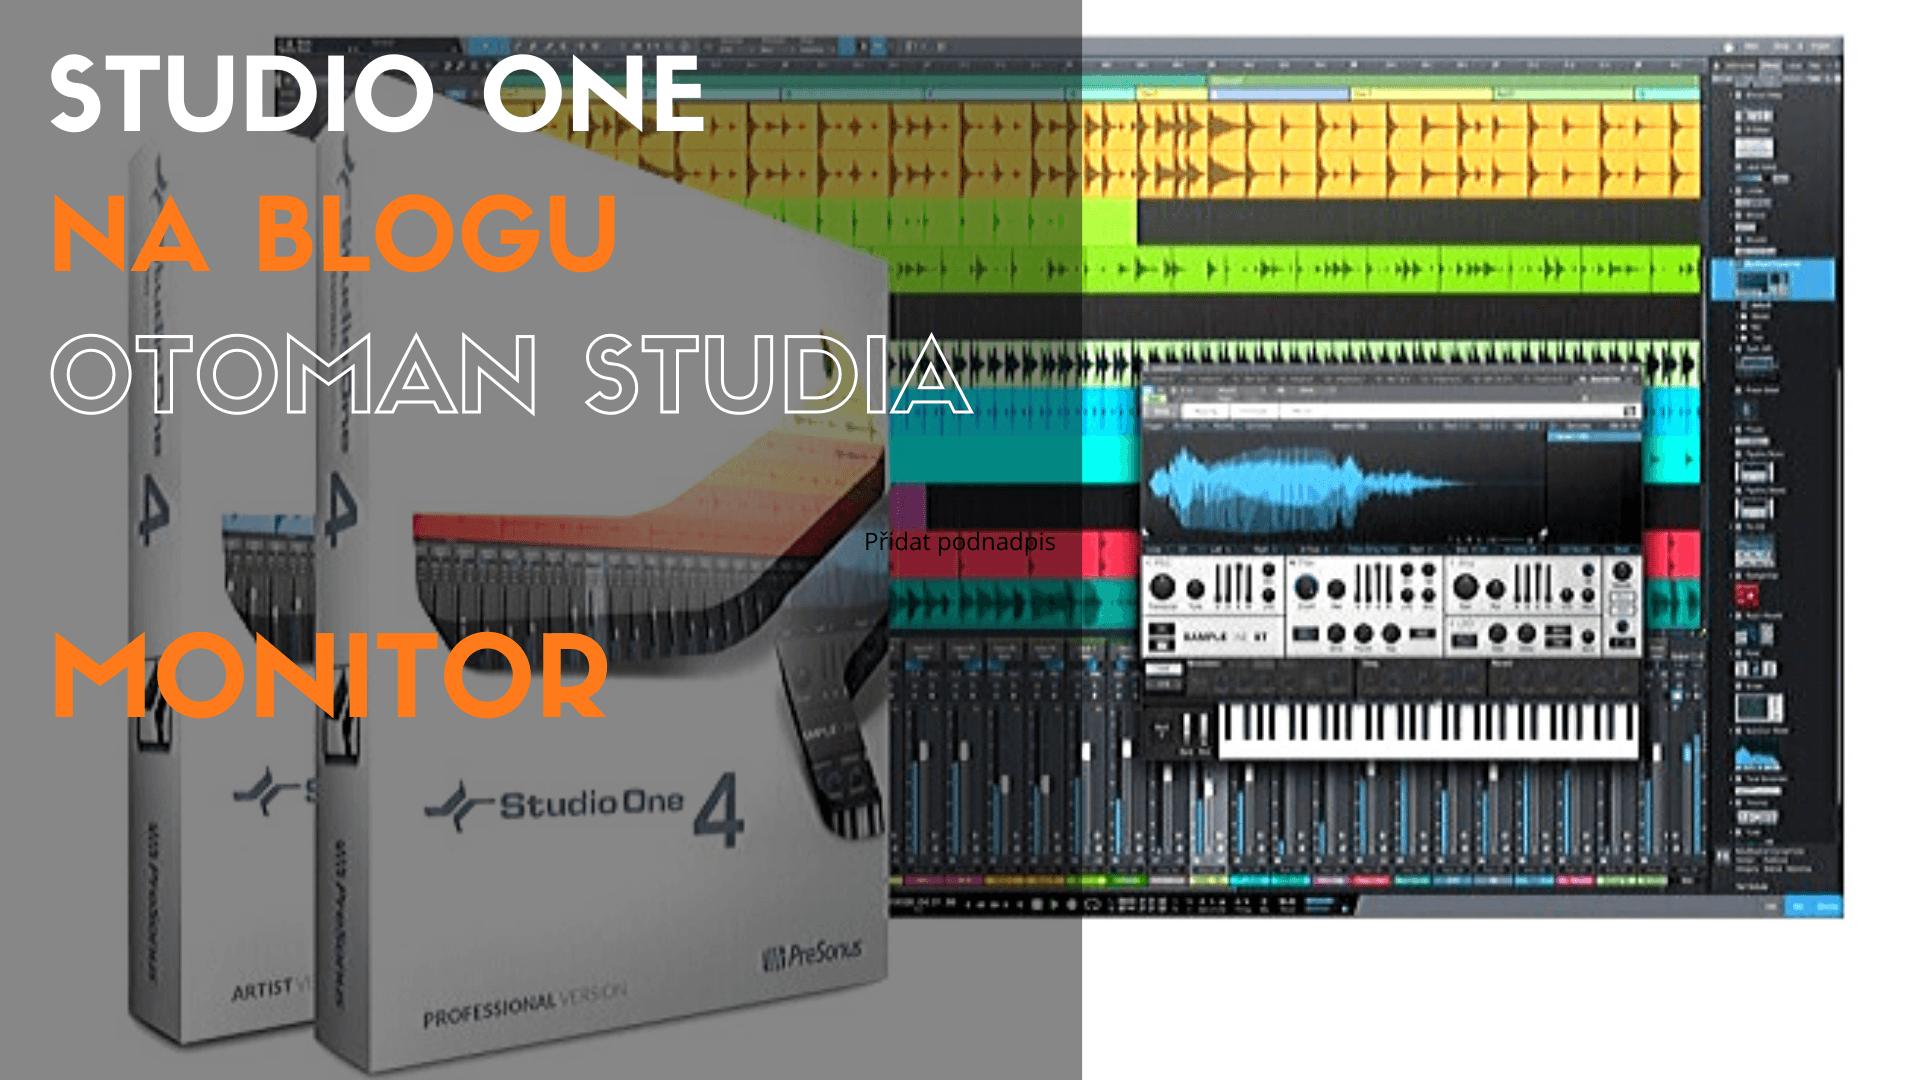 Studio One – Monitor